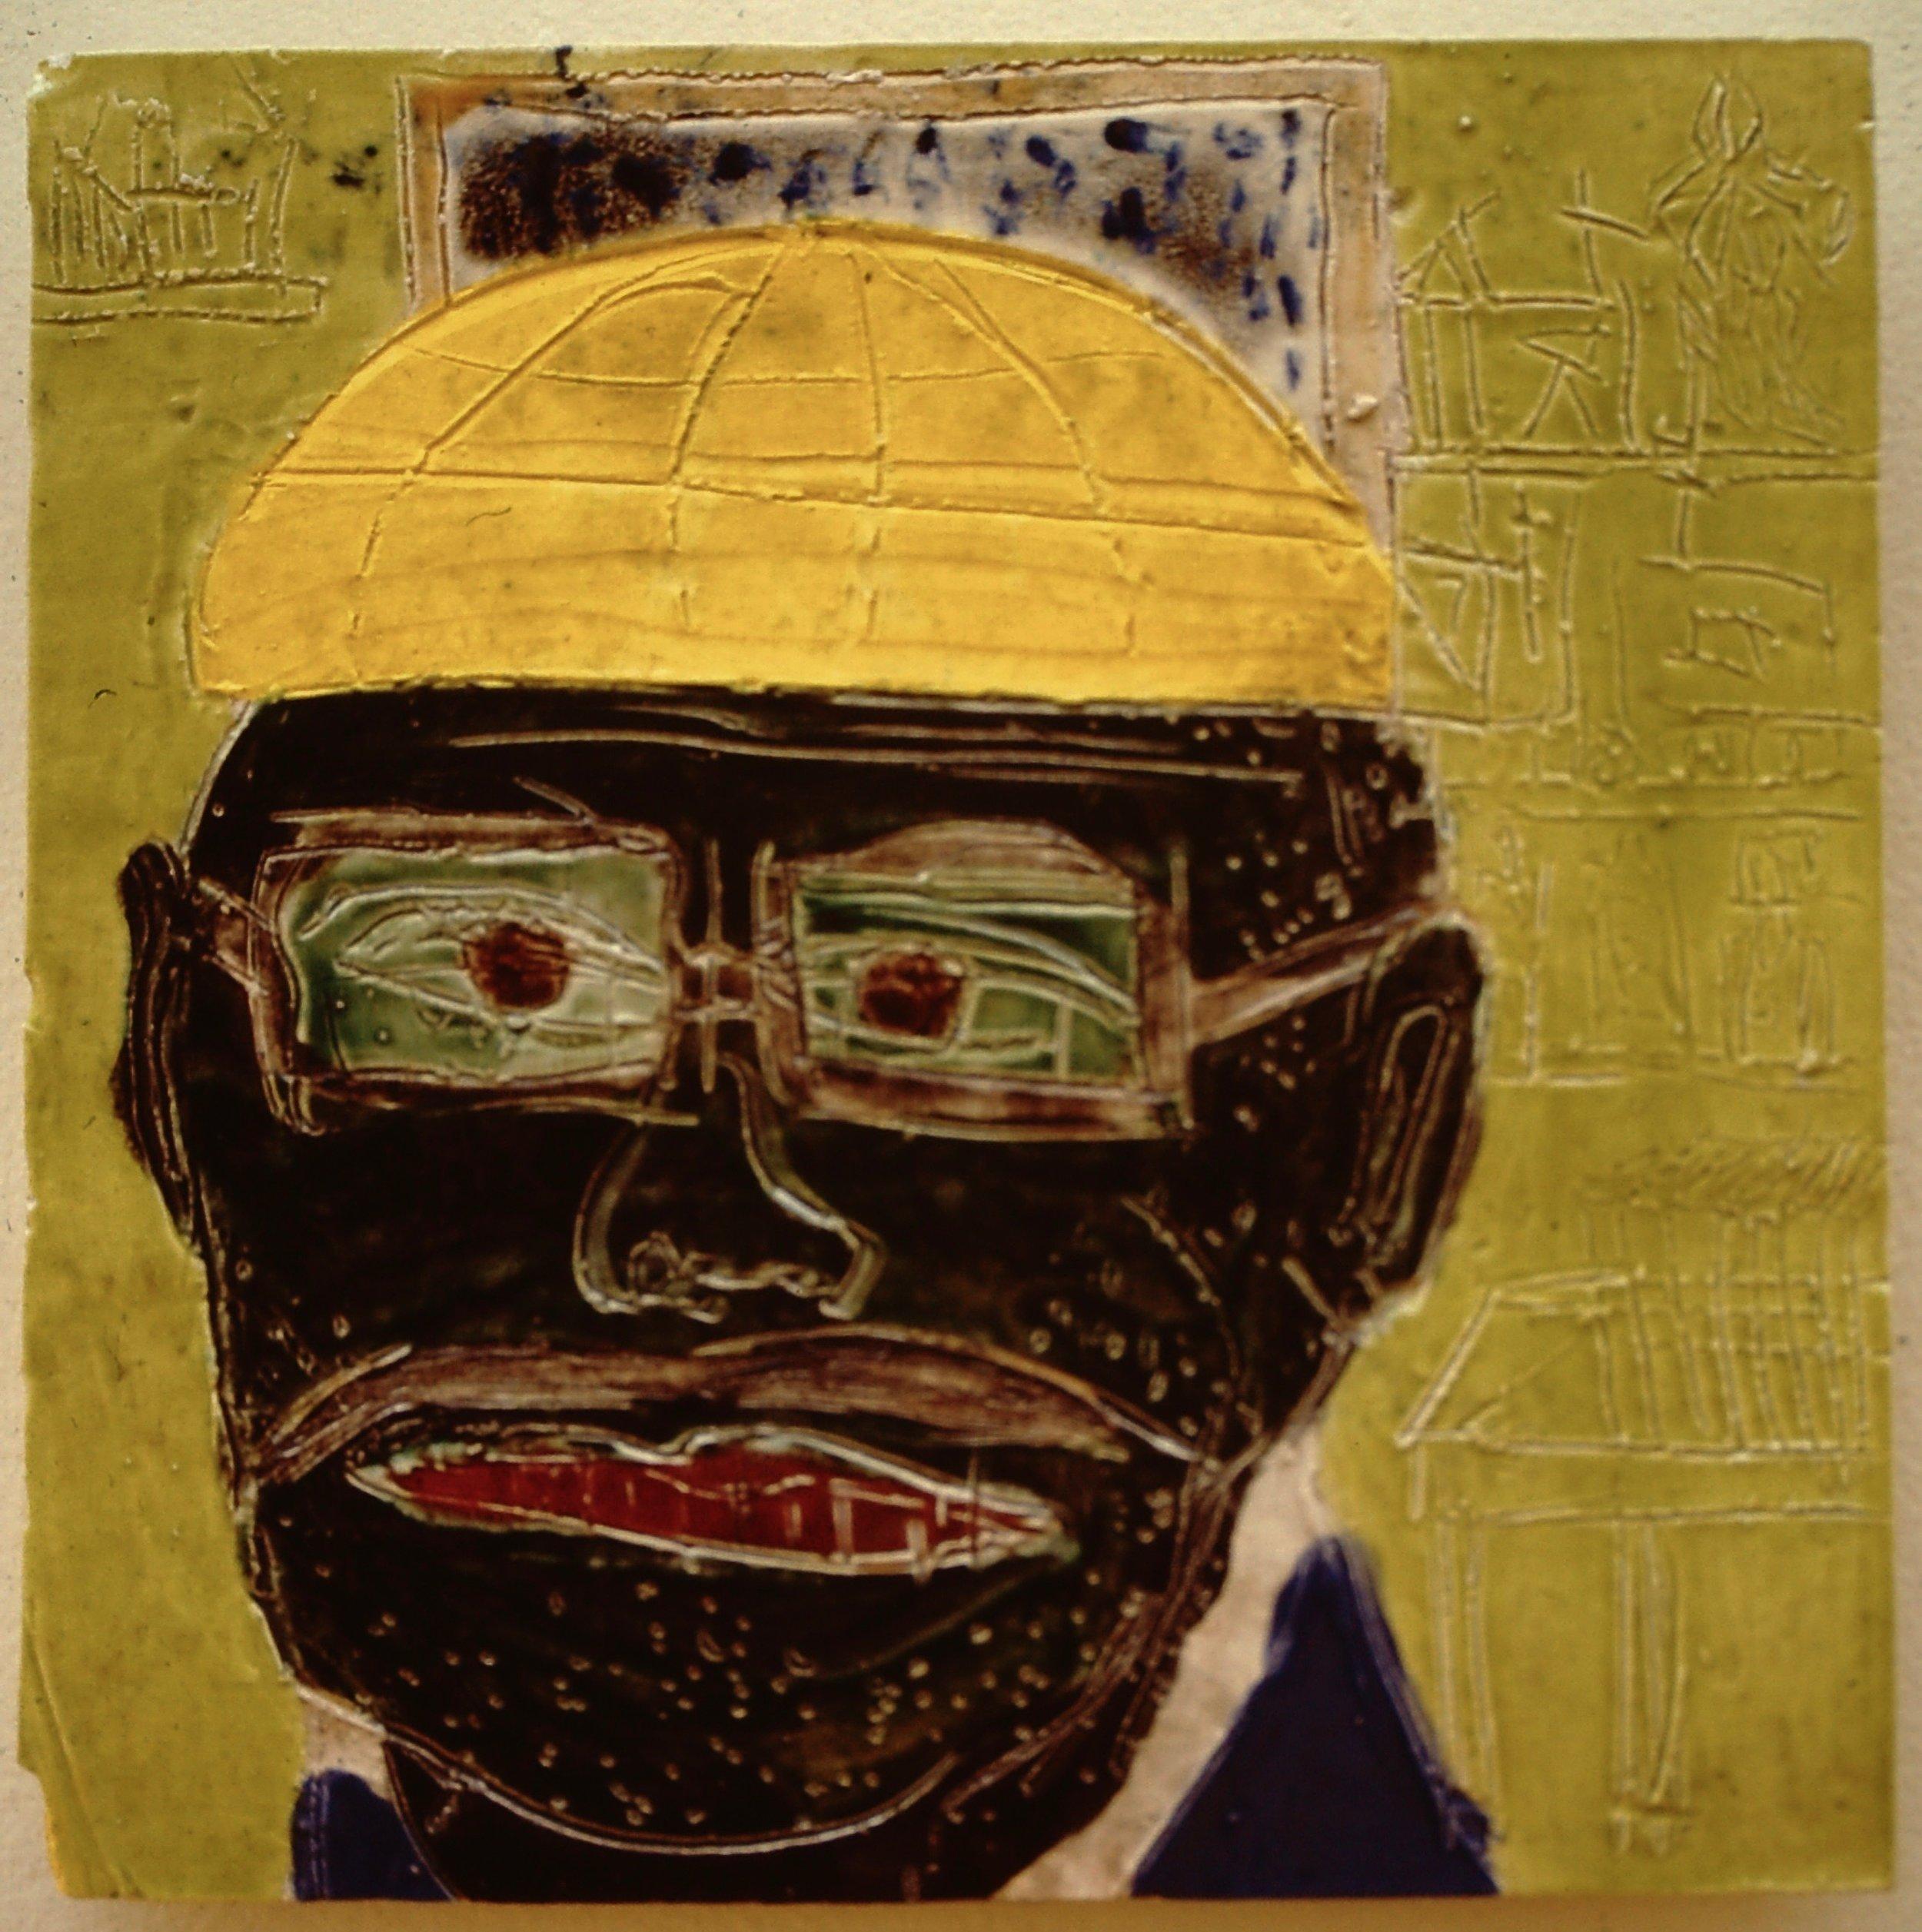 Leroy Johnson, 1996